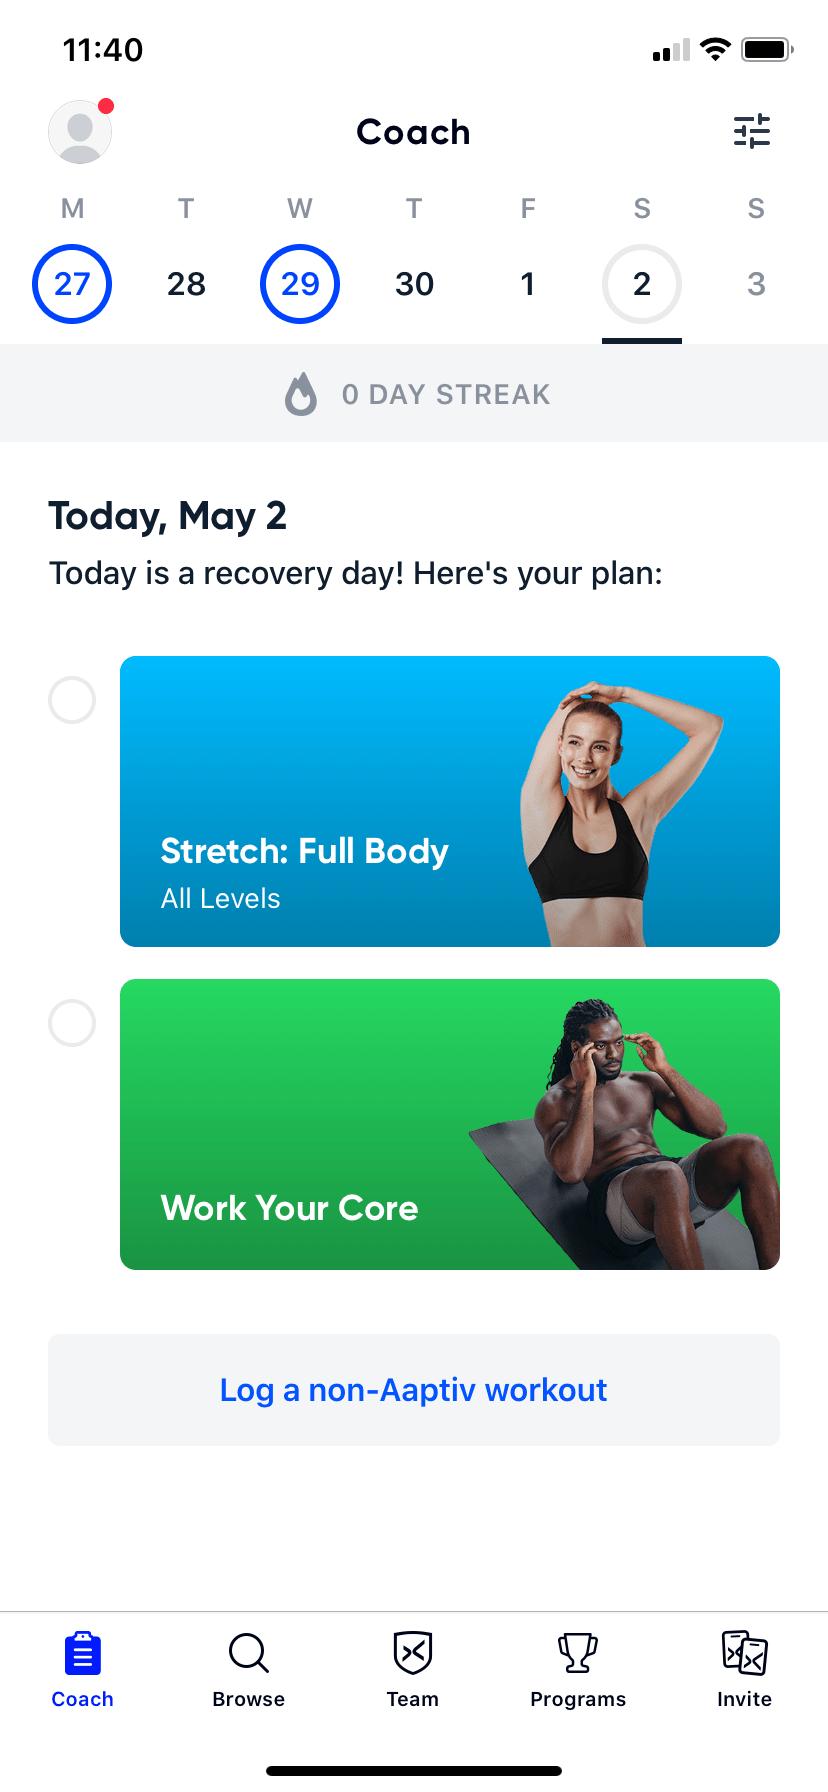 Aaptiv workout routine